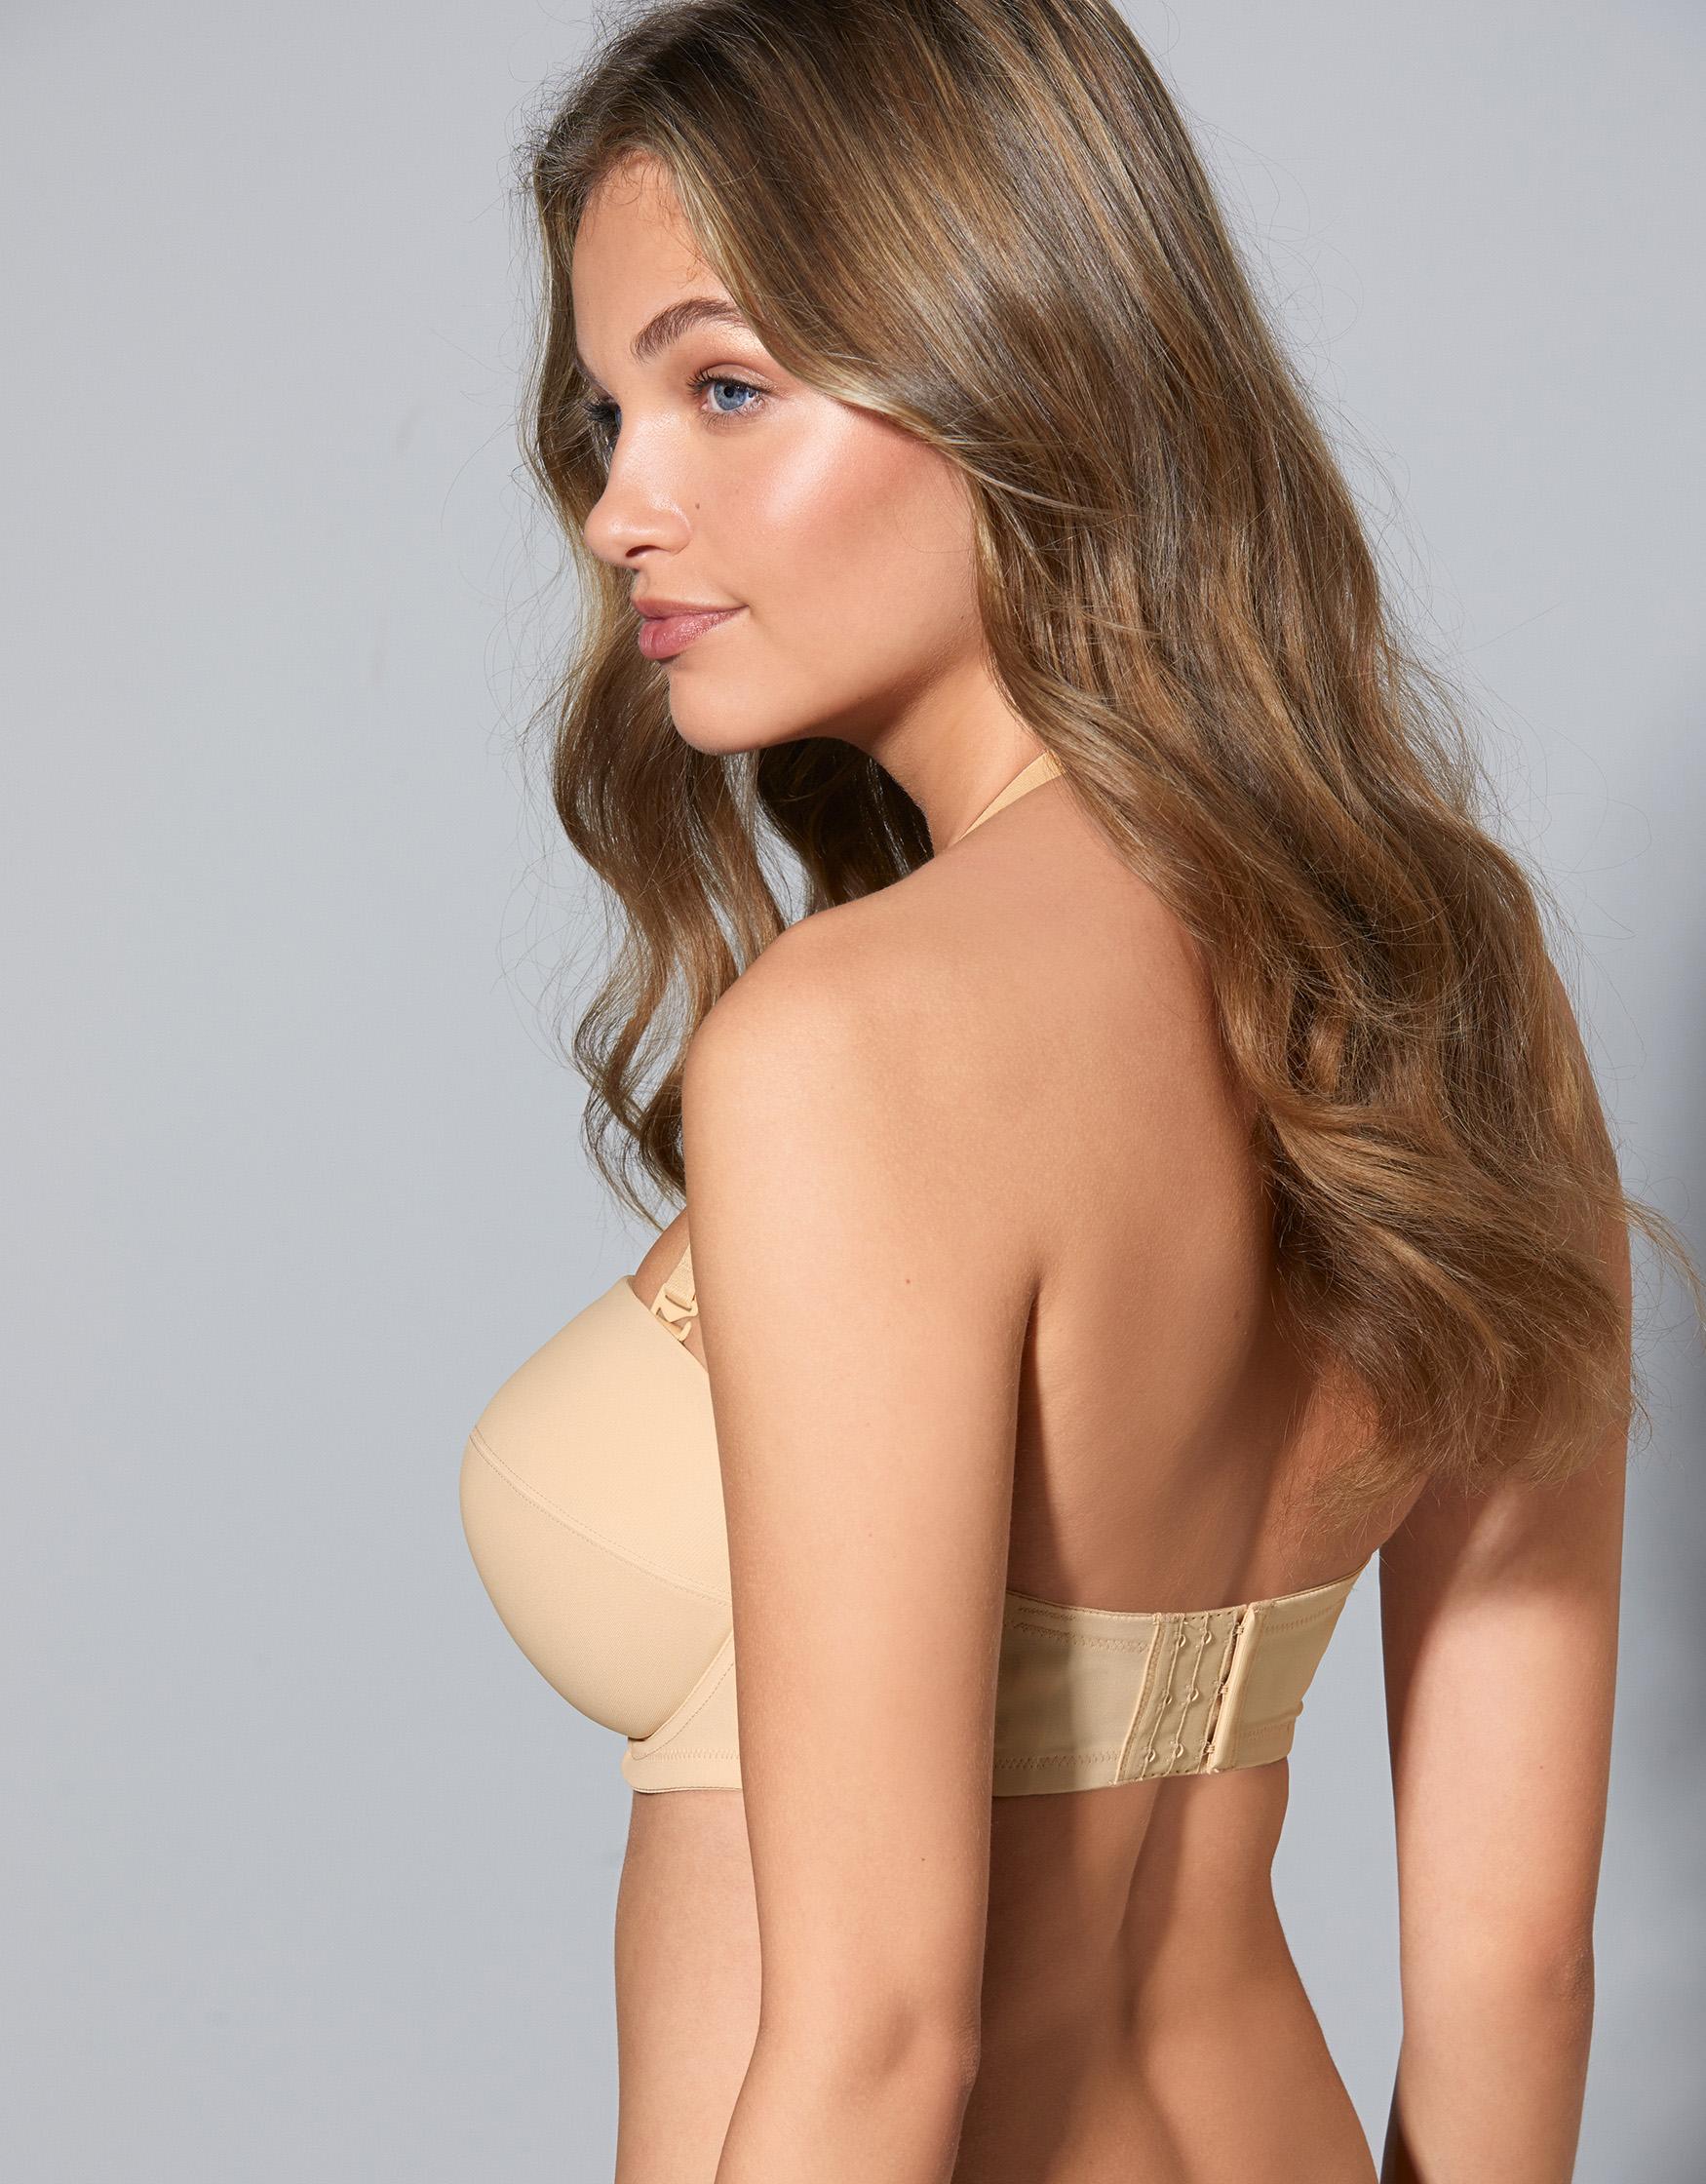 Evie model nøgen